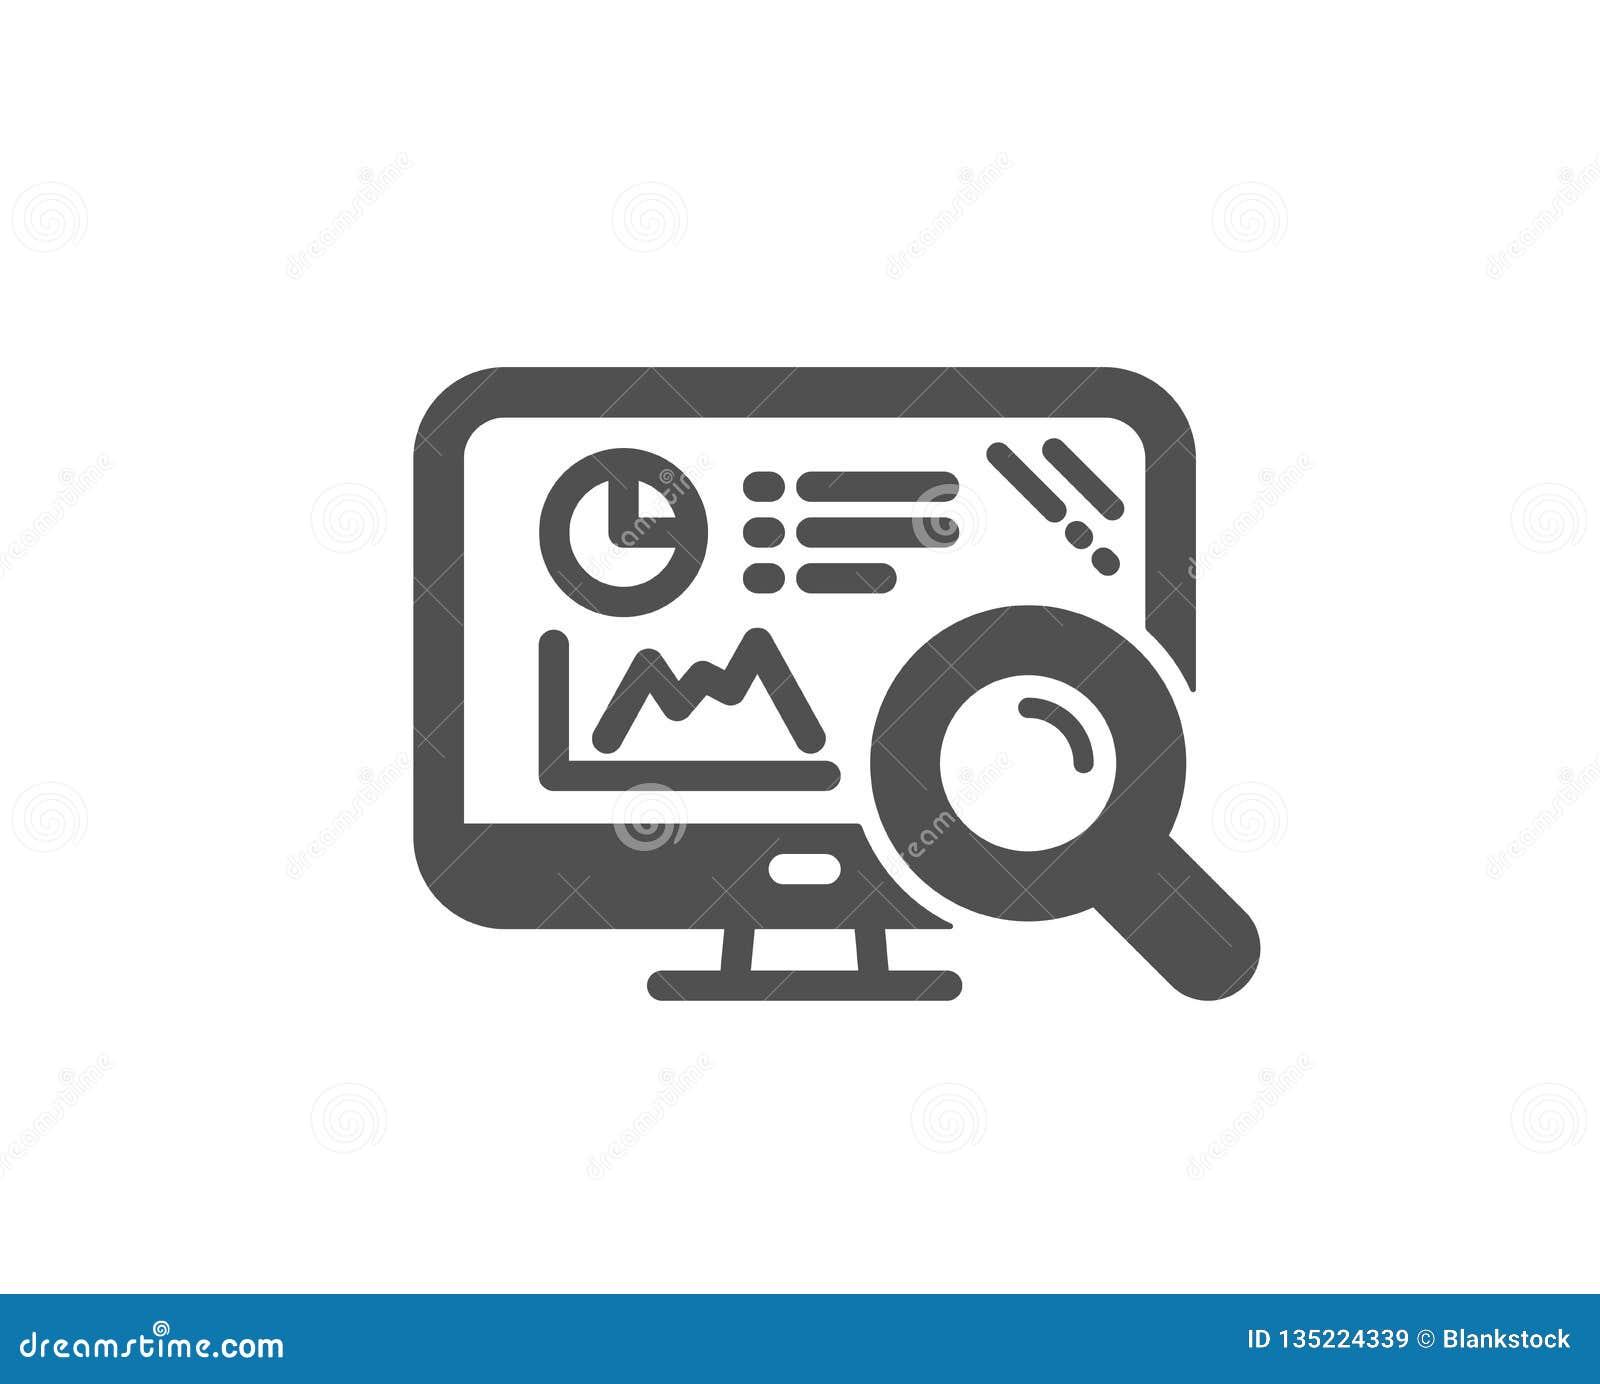 Seo Statistics Icon  Search Engine Sign  Vector Stock Vector